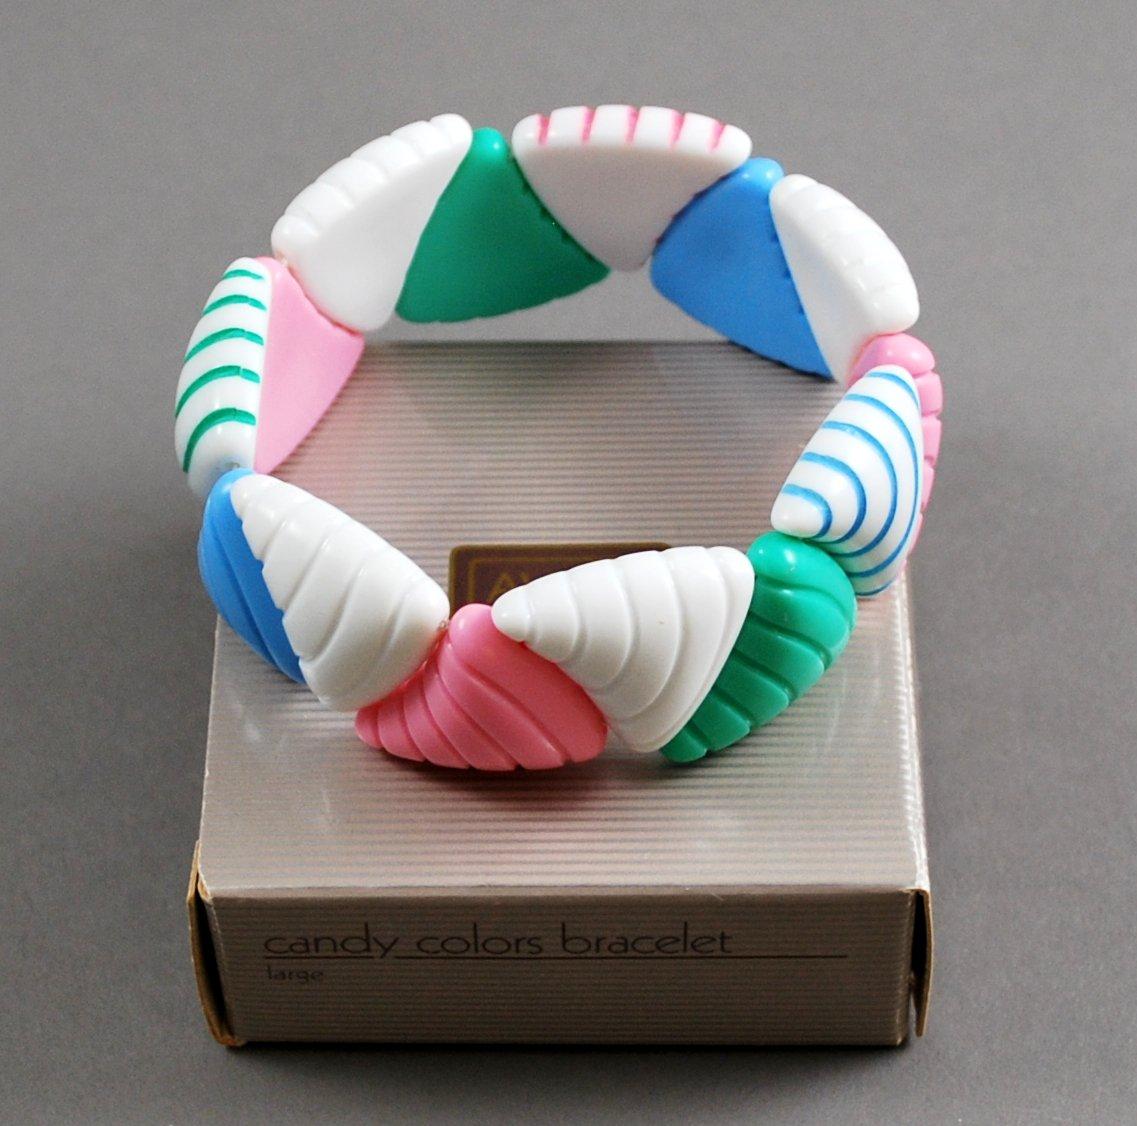 1986 Avon Candy Colors Stretch Plastic Bracelet